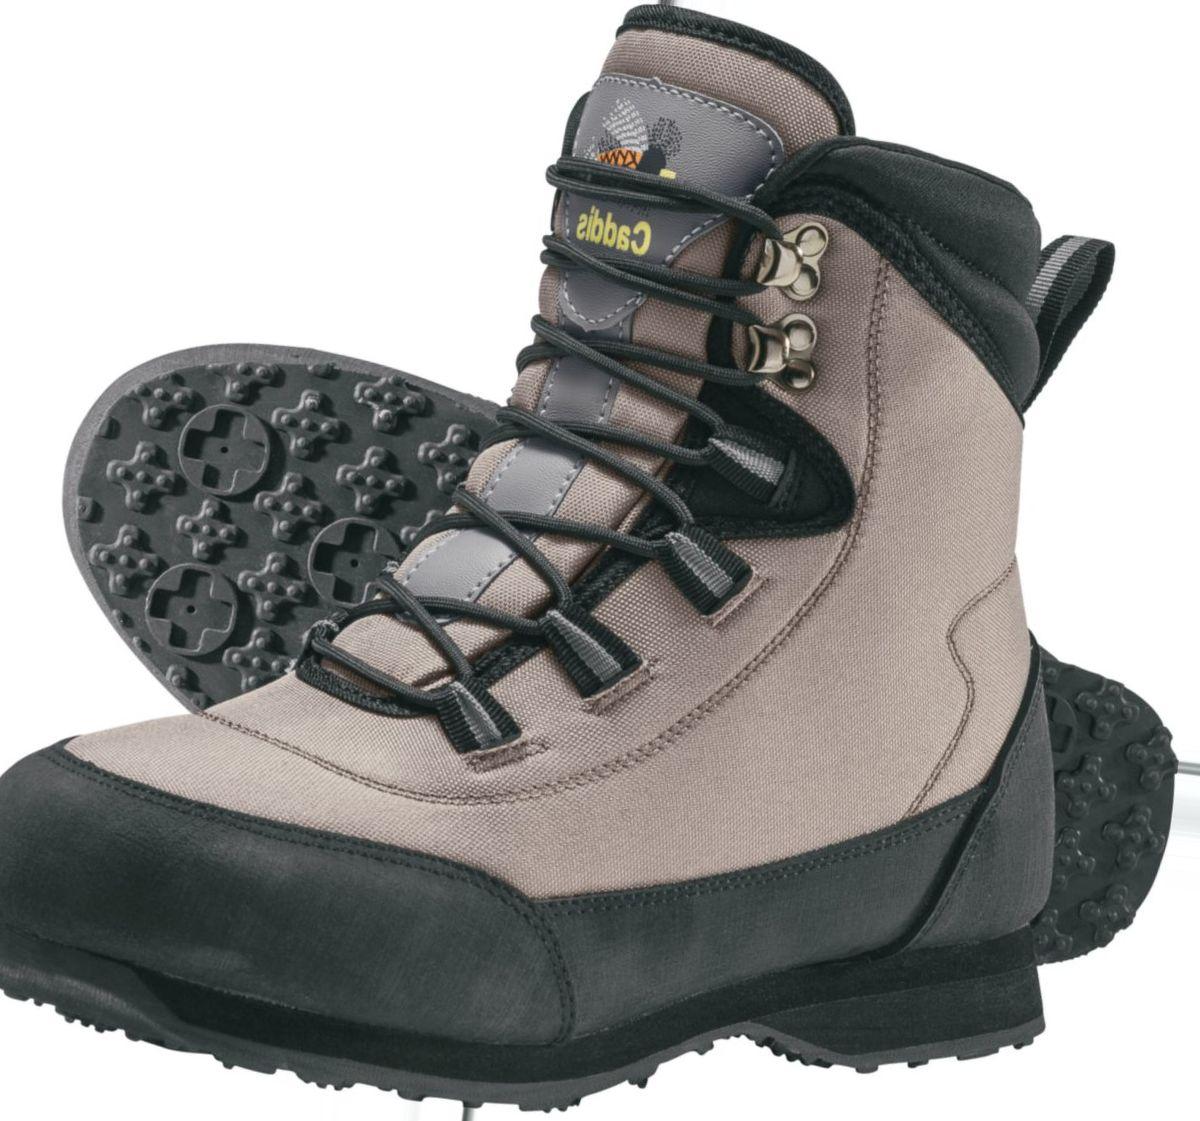 Caddis Men's Northern Guide Ultralite Wading Boots – EcoSmart™ II Lug Sole